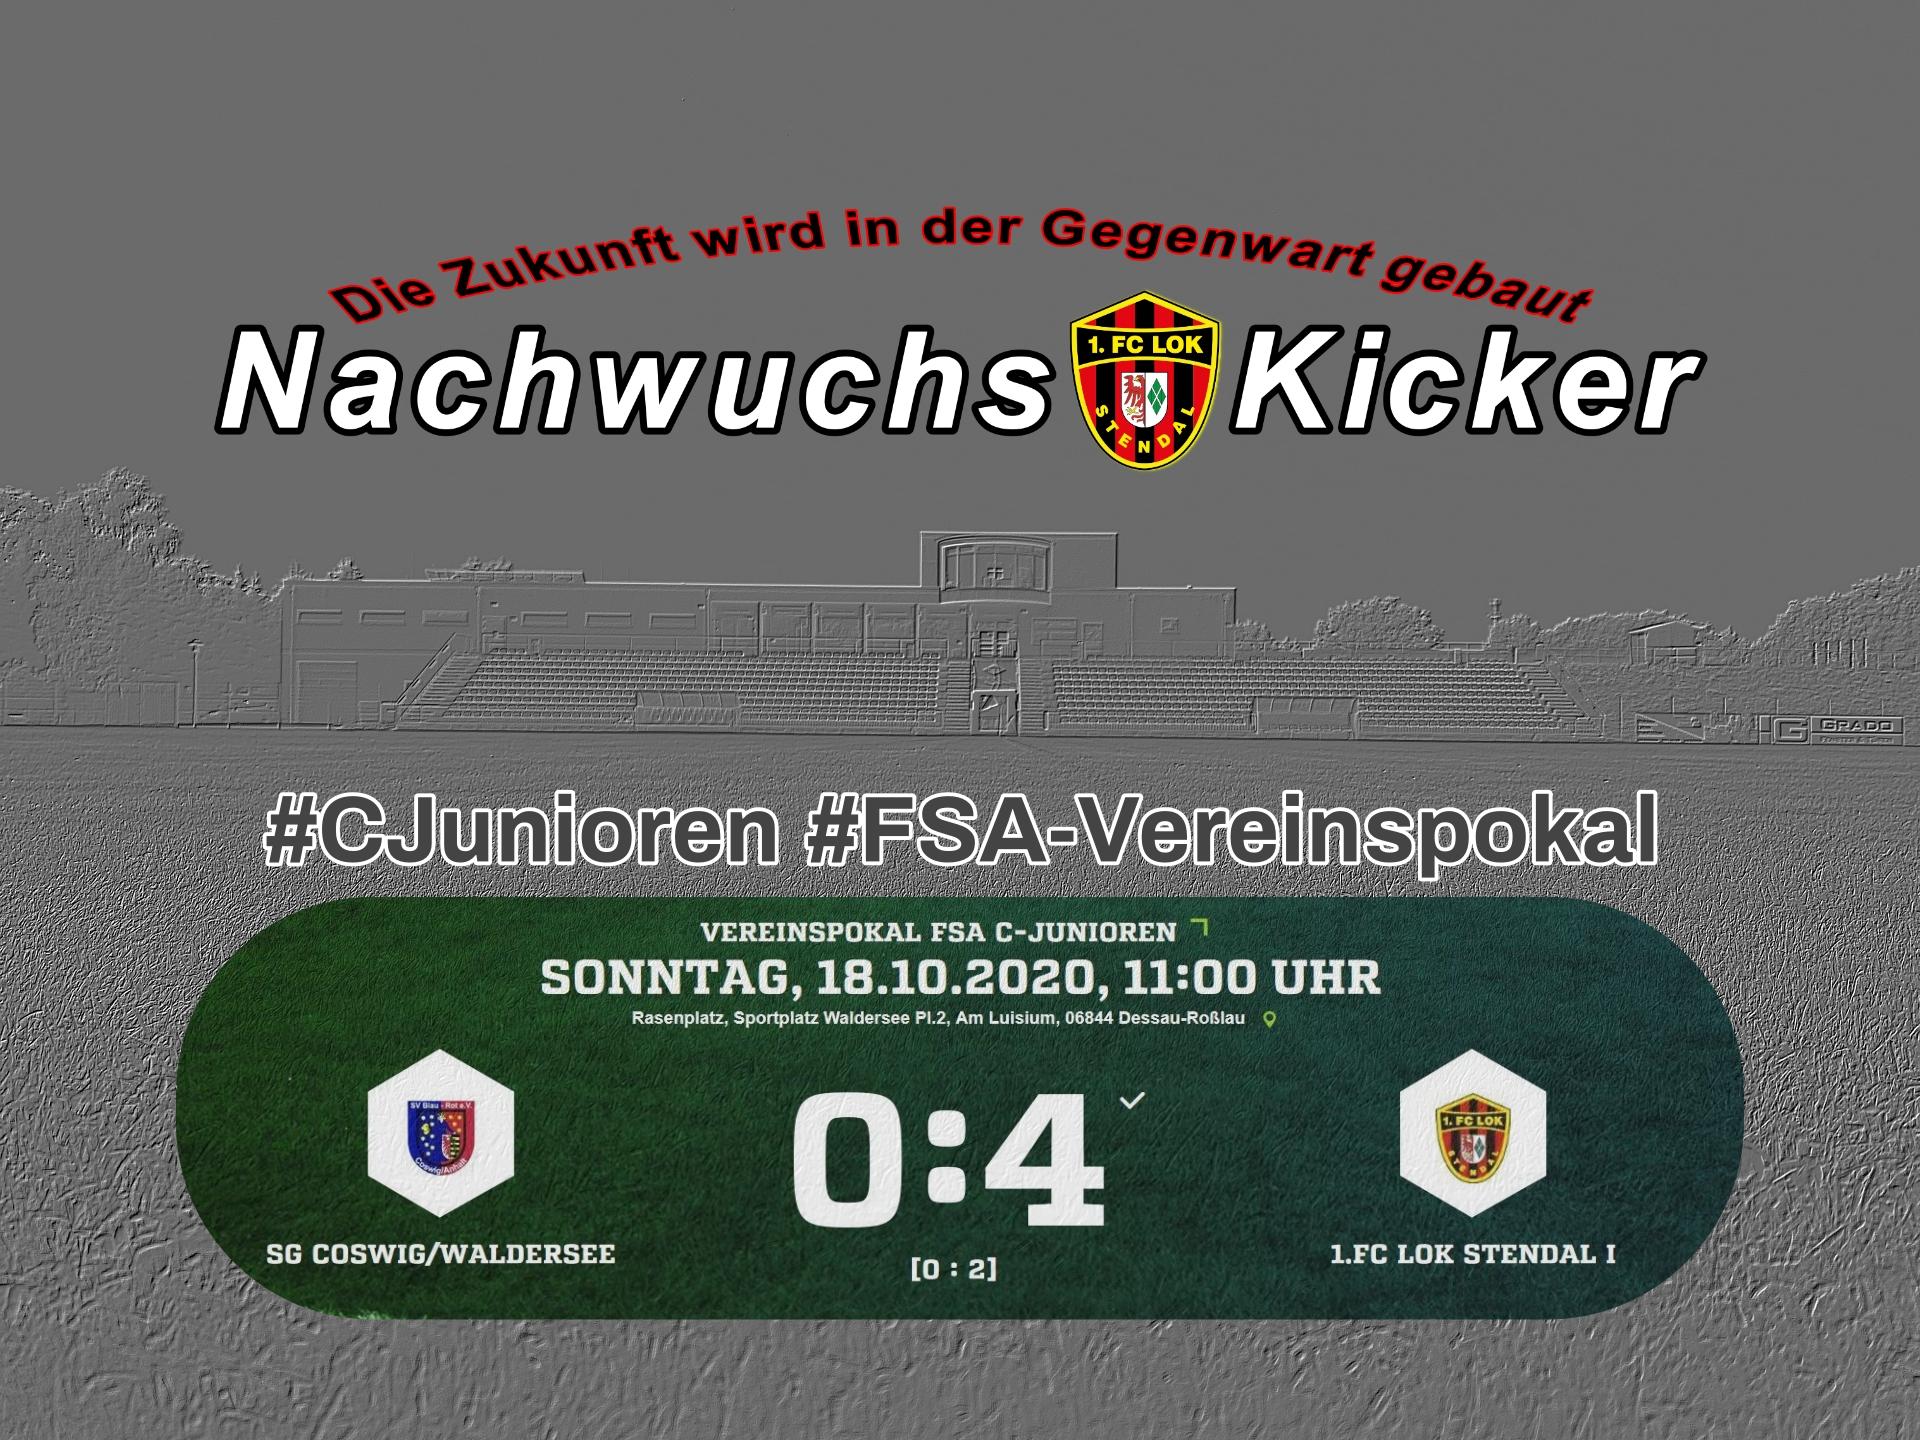 #CJunioren ► FSA-Vereinspokal - 1. FC Lok Stendal